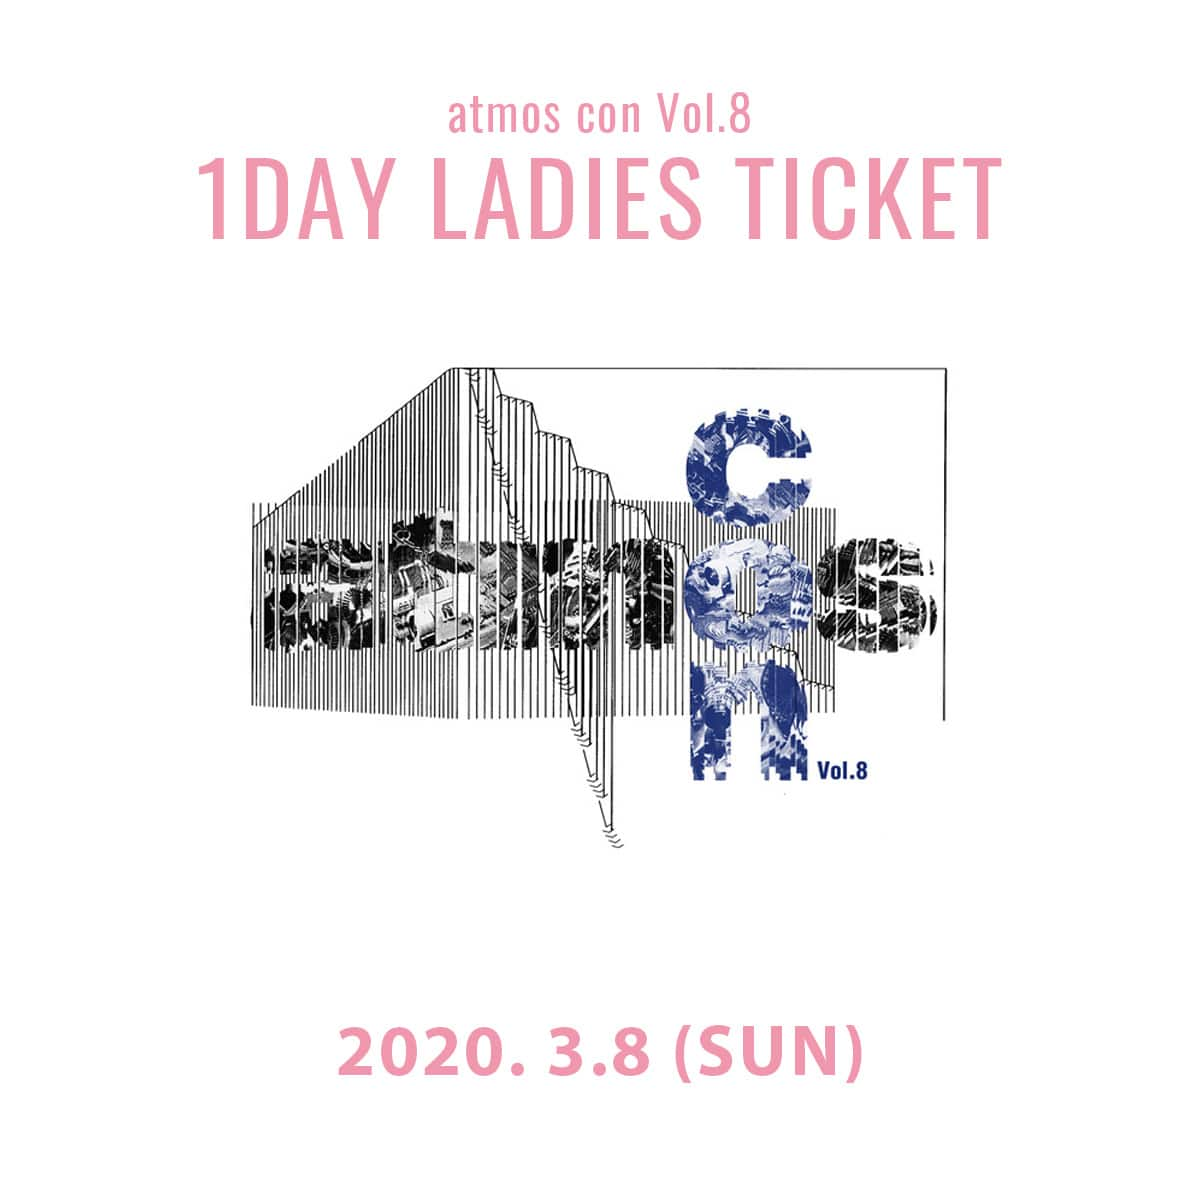 atmos con Vol.8 女性入場無料チケット(3月8日) 1DAY 20SP-S_photo_large